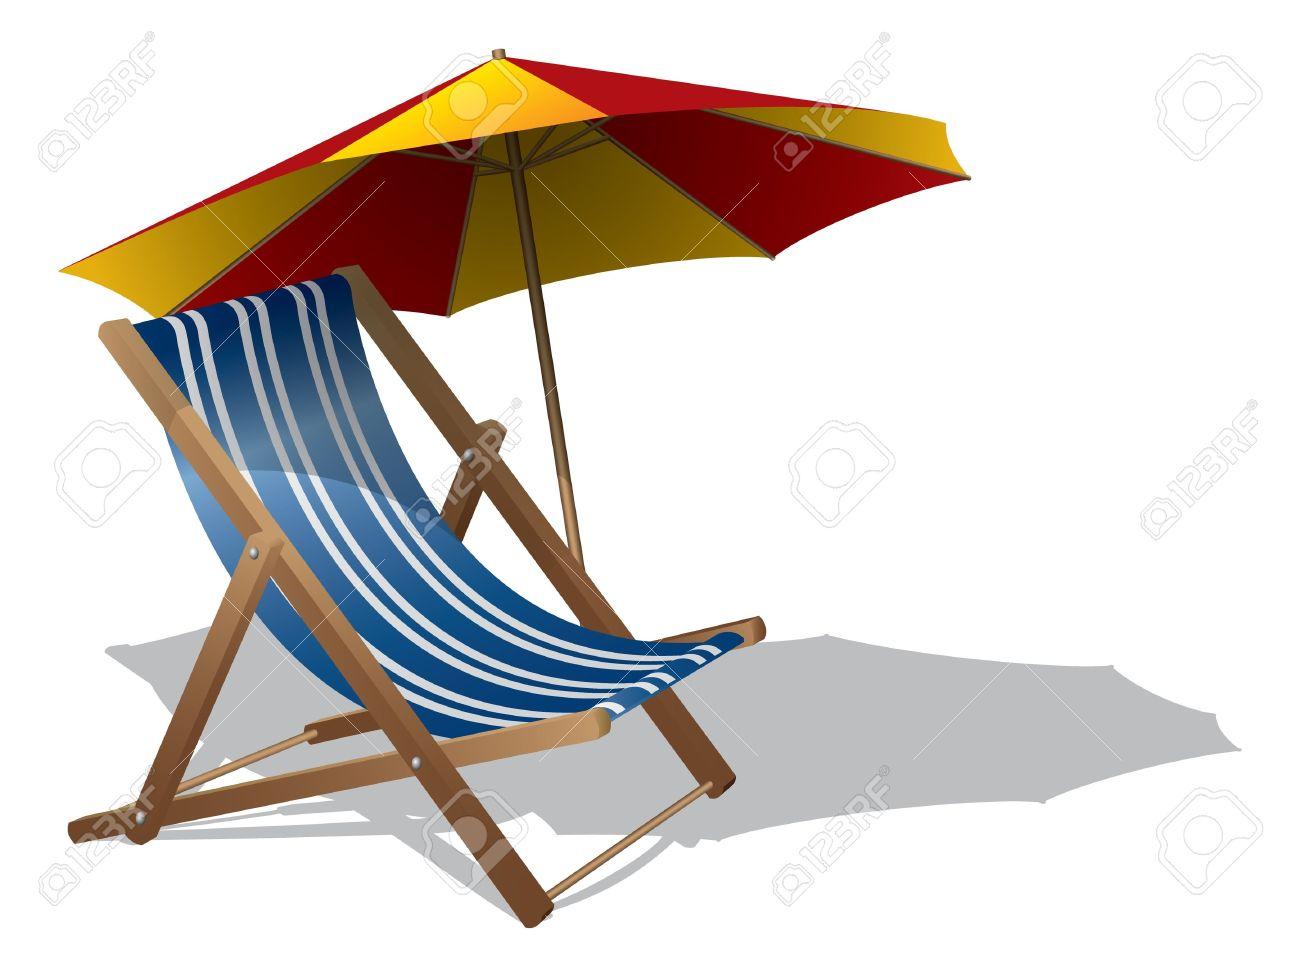 Beach chair with umbrella - Beach Chair With Umbrella Stock Vector 12851973